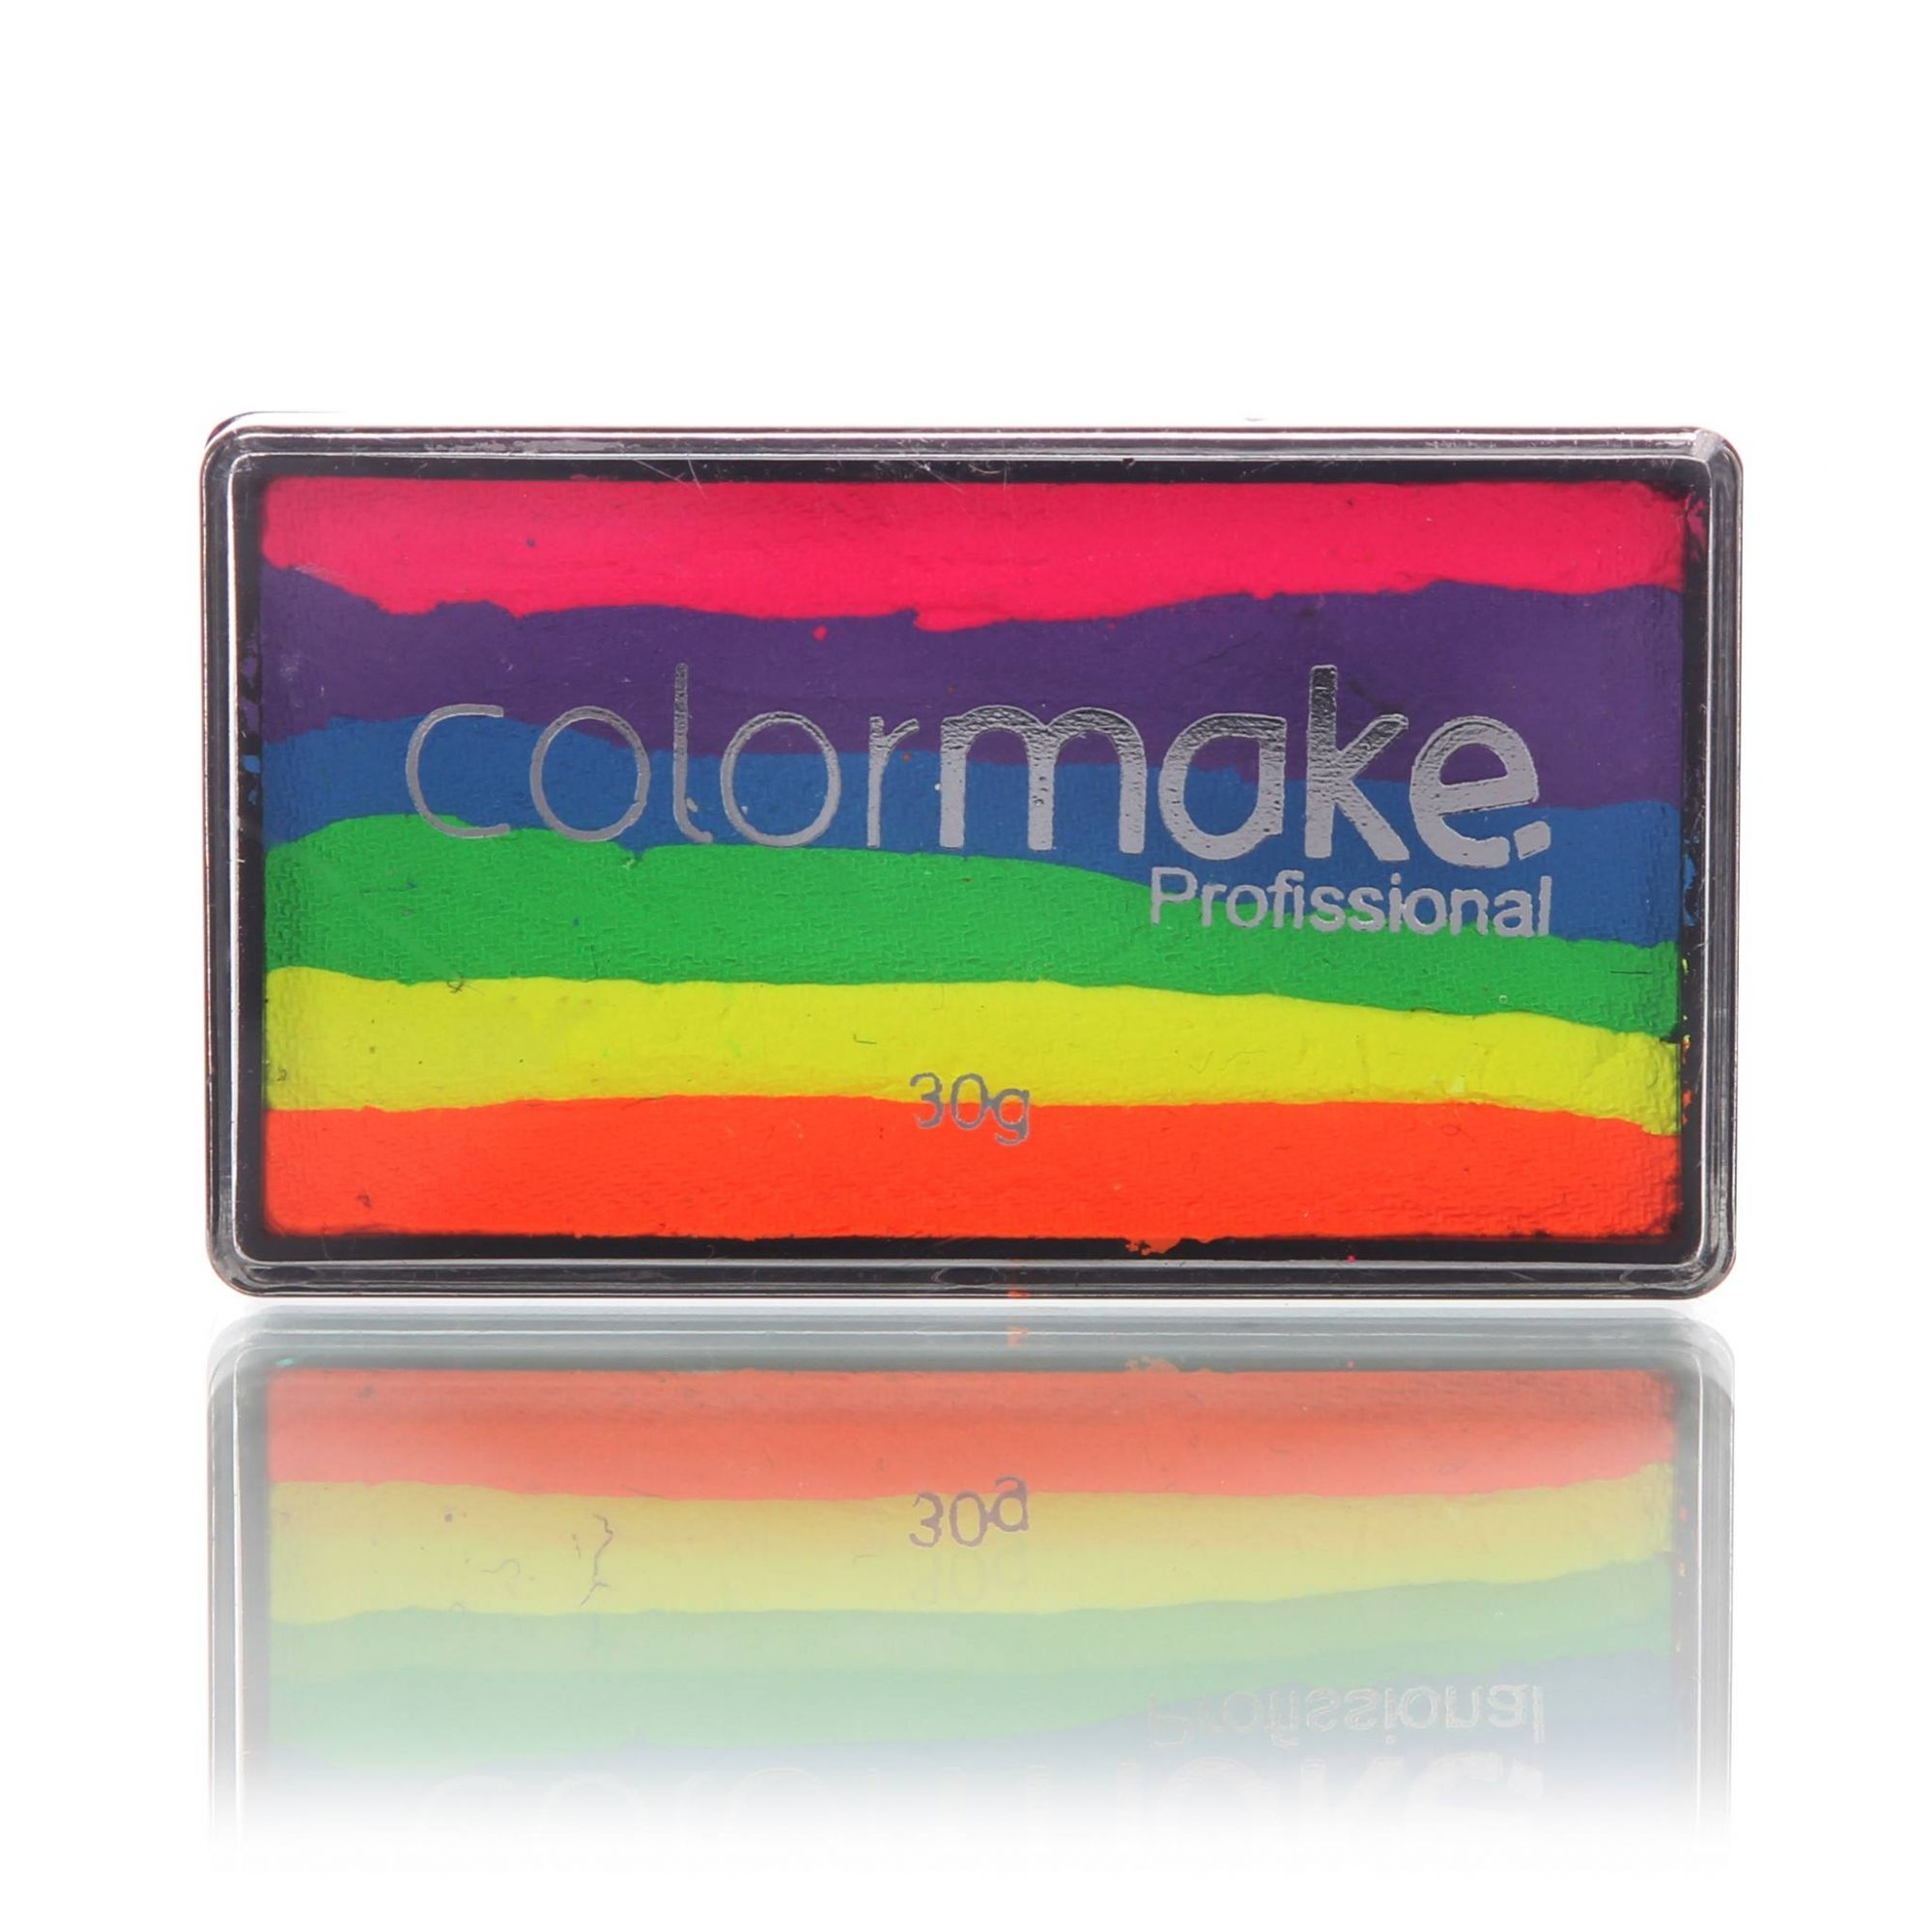 Block Colormake Flúor 30gr. cod. 0956 Cores (PK, RX, AZ, VD, AM, LR)